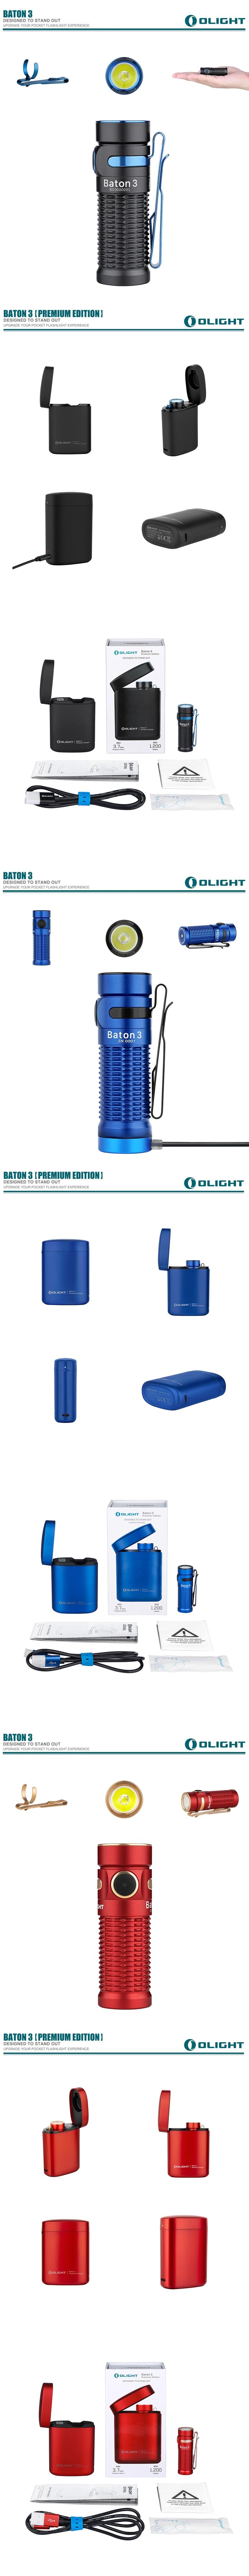 Olight Baton 3 Premium Edition  1,200 lumens powerful Baton 3 and portable wireless charger (1)